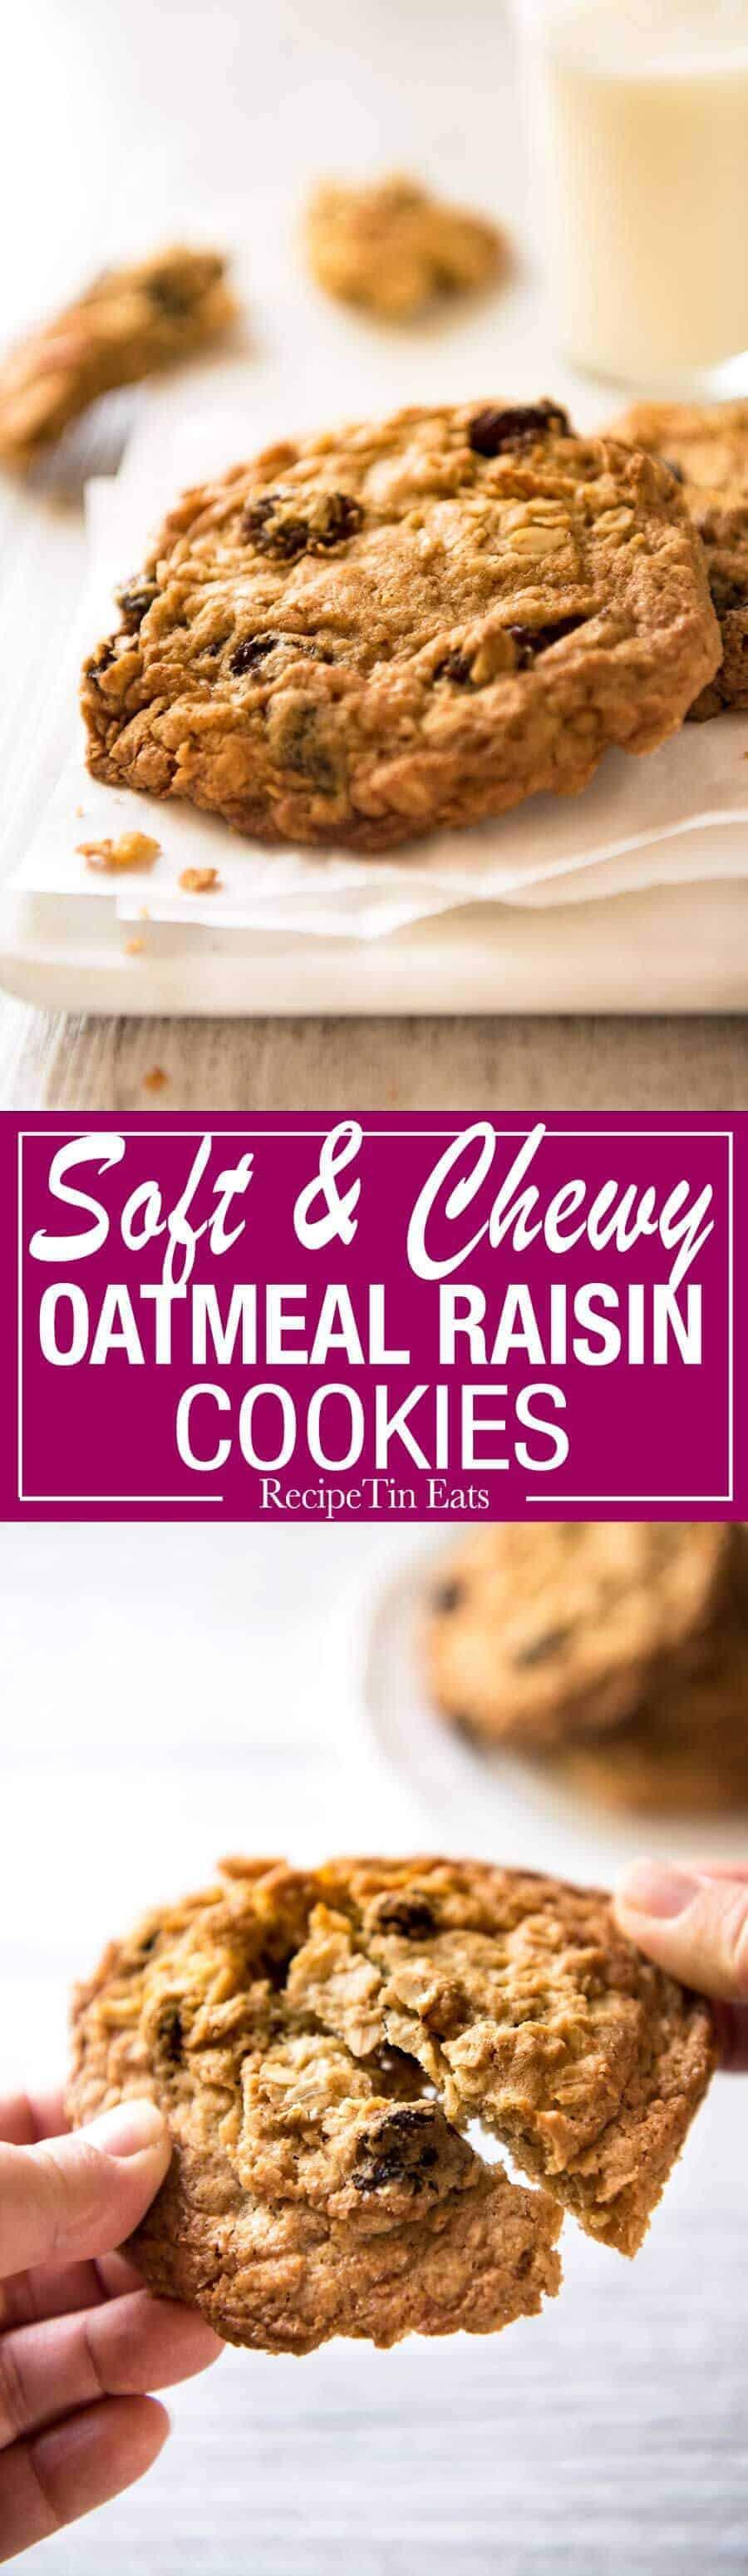 Oatmeal Raisin Cookie recipe - for perfect big, soft, moist, CHEWY Oatmeal Raisin Cookies! recipetineats.com